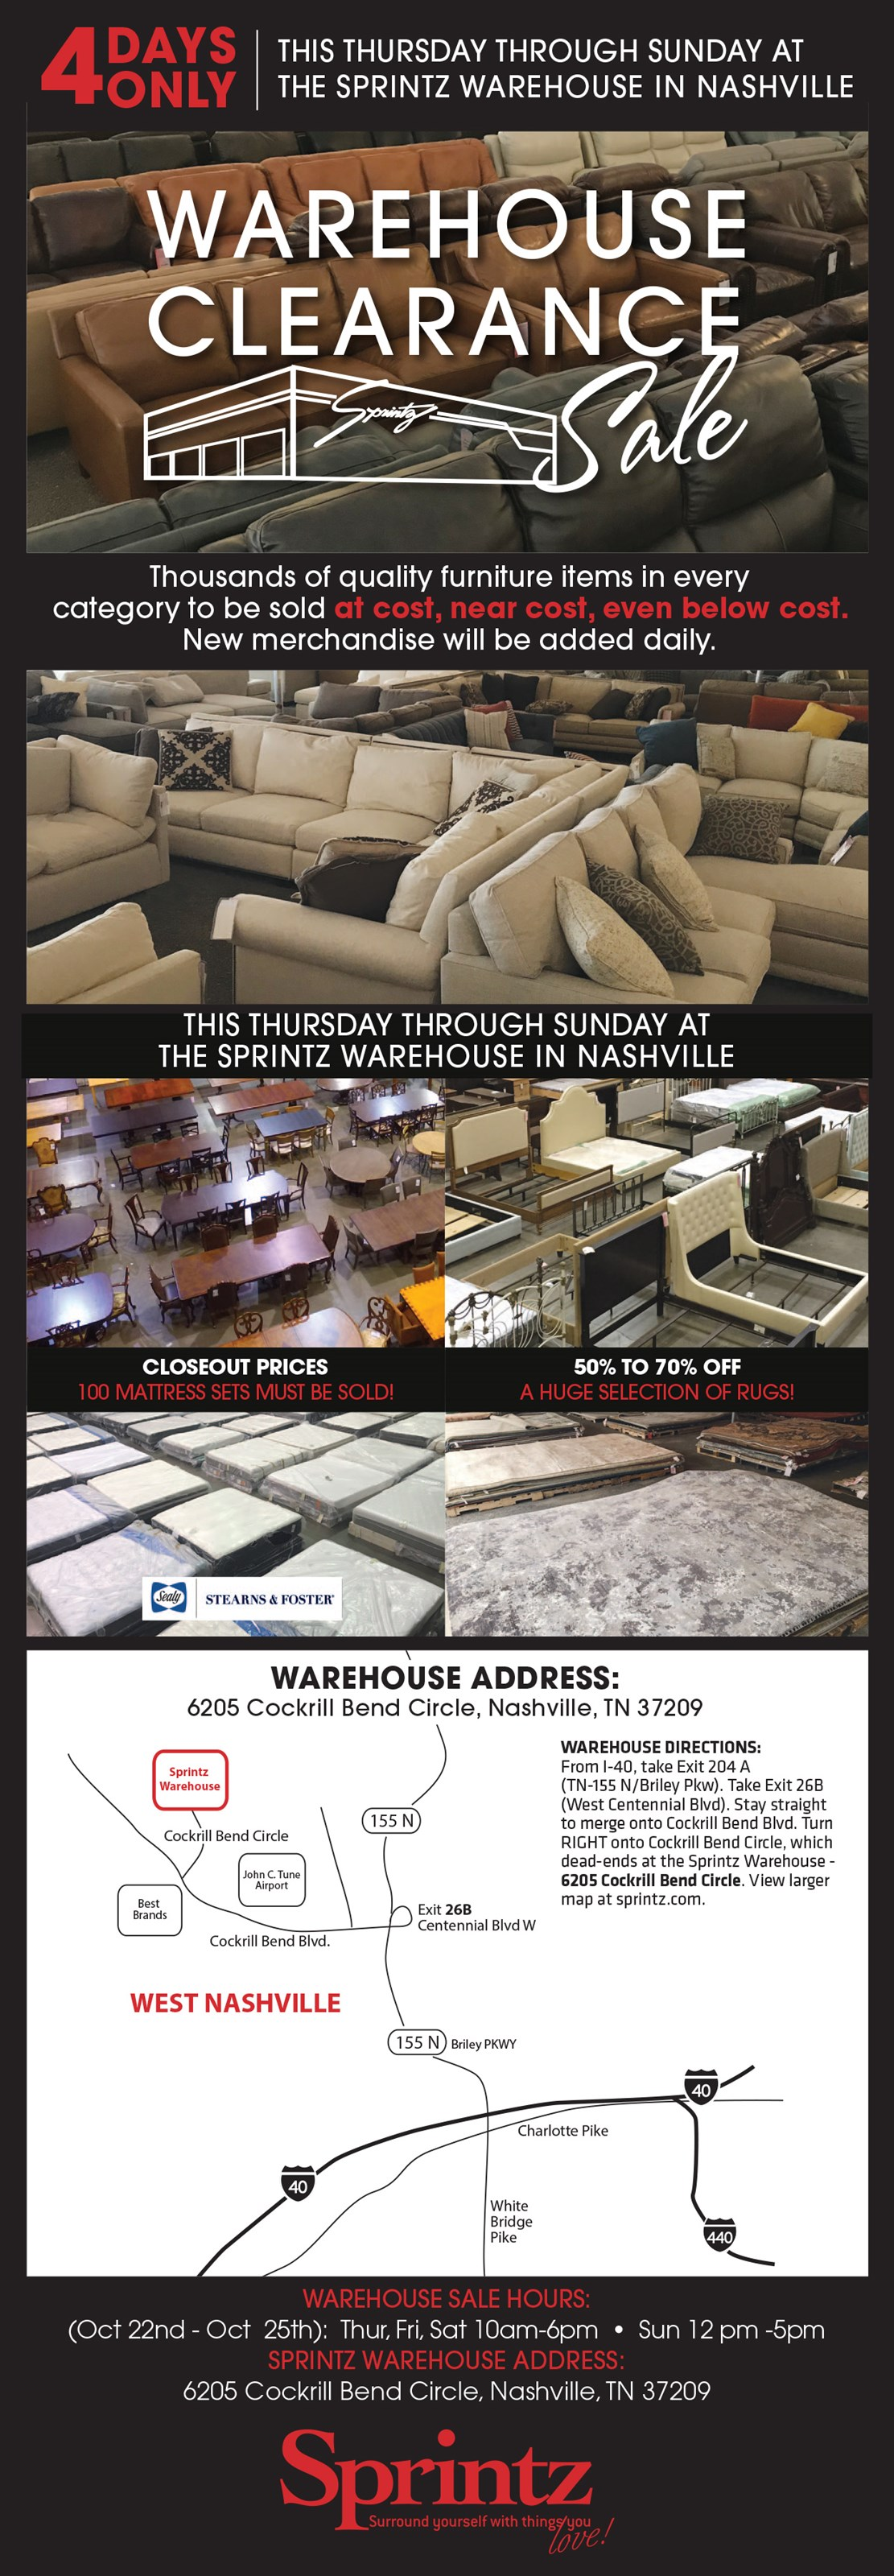 WarehouseSale